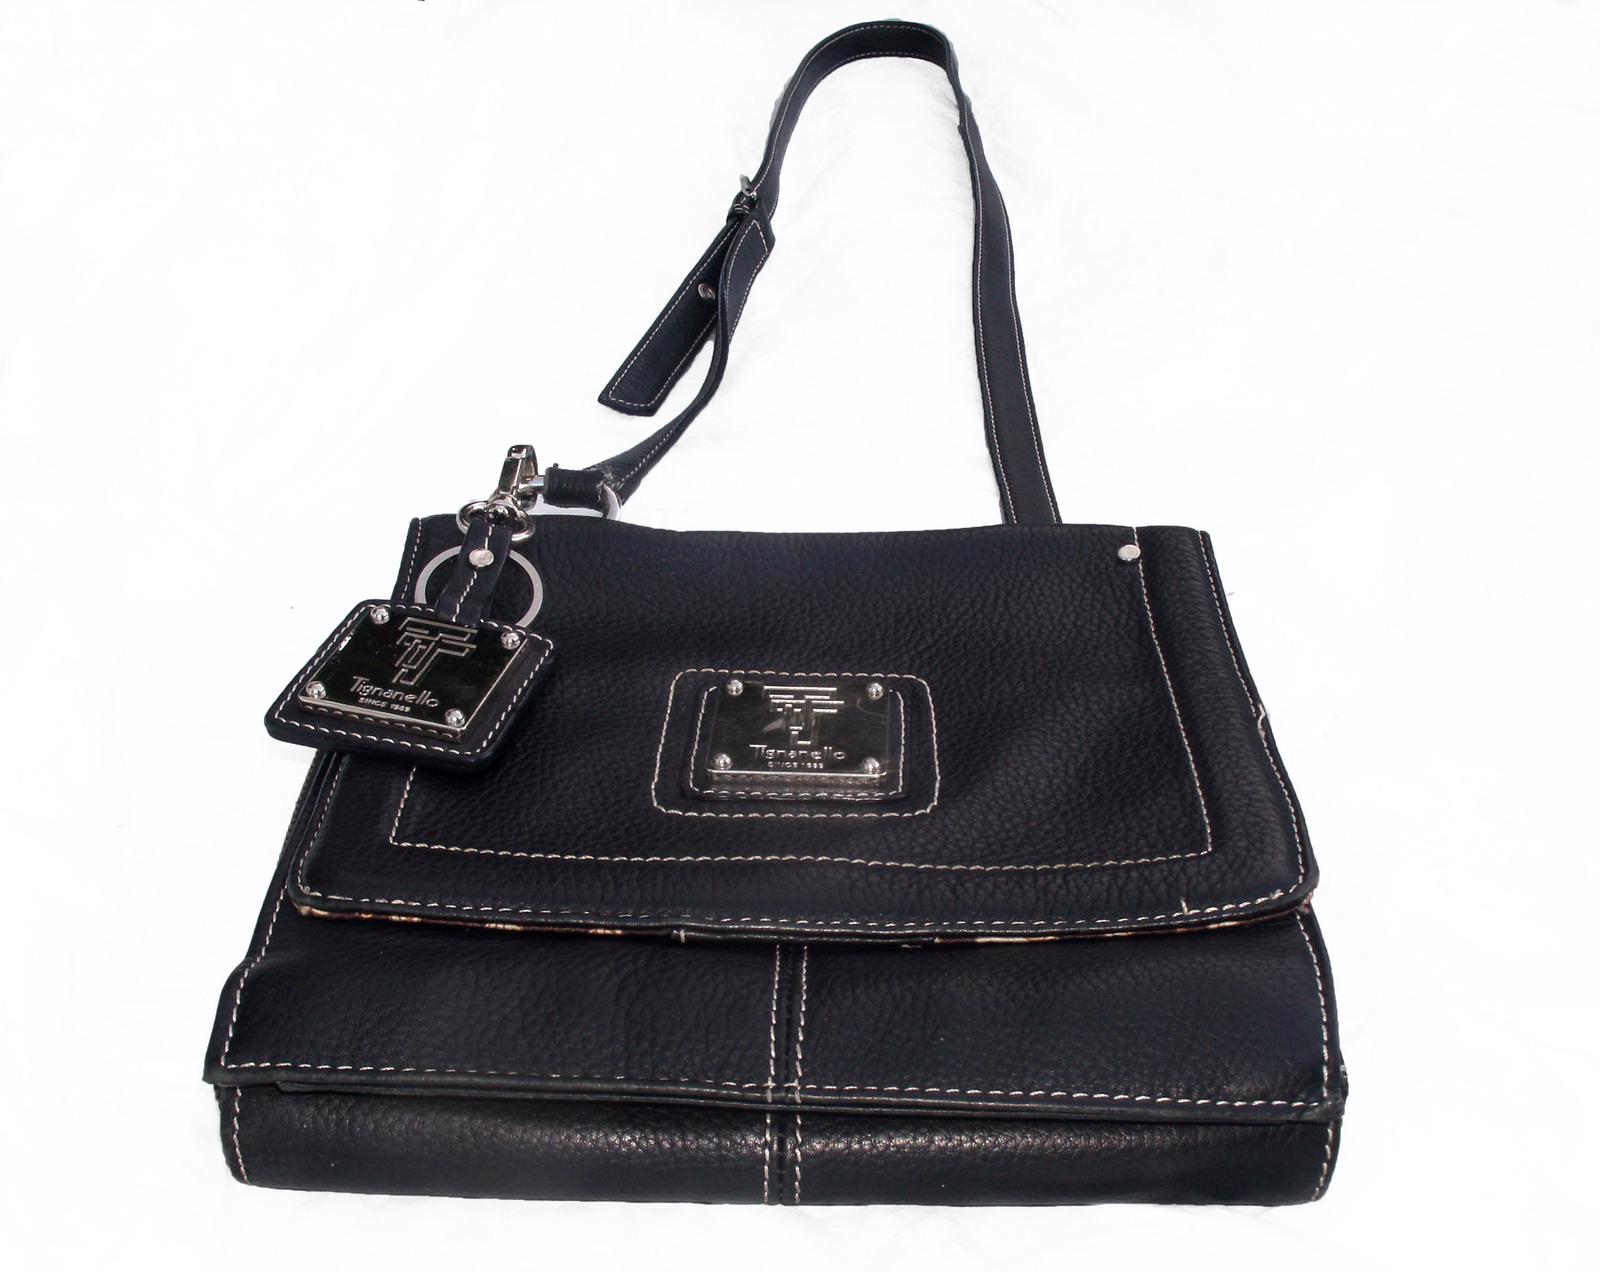 Tignanello Black Pebbled Leather Organizer Crossbody built in Wallet image 9